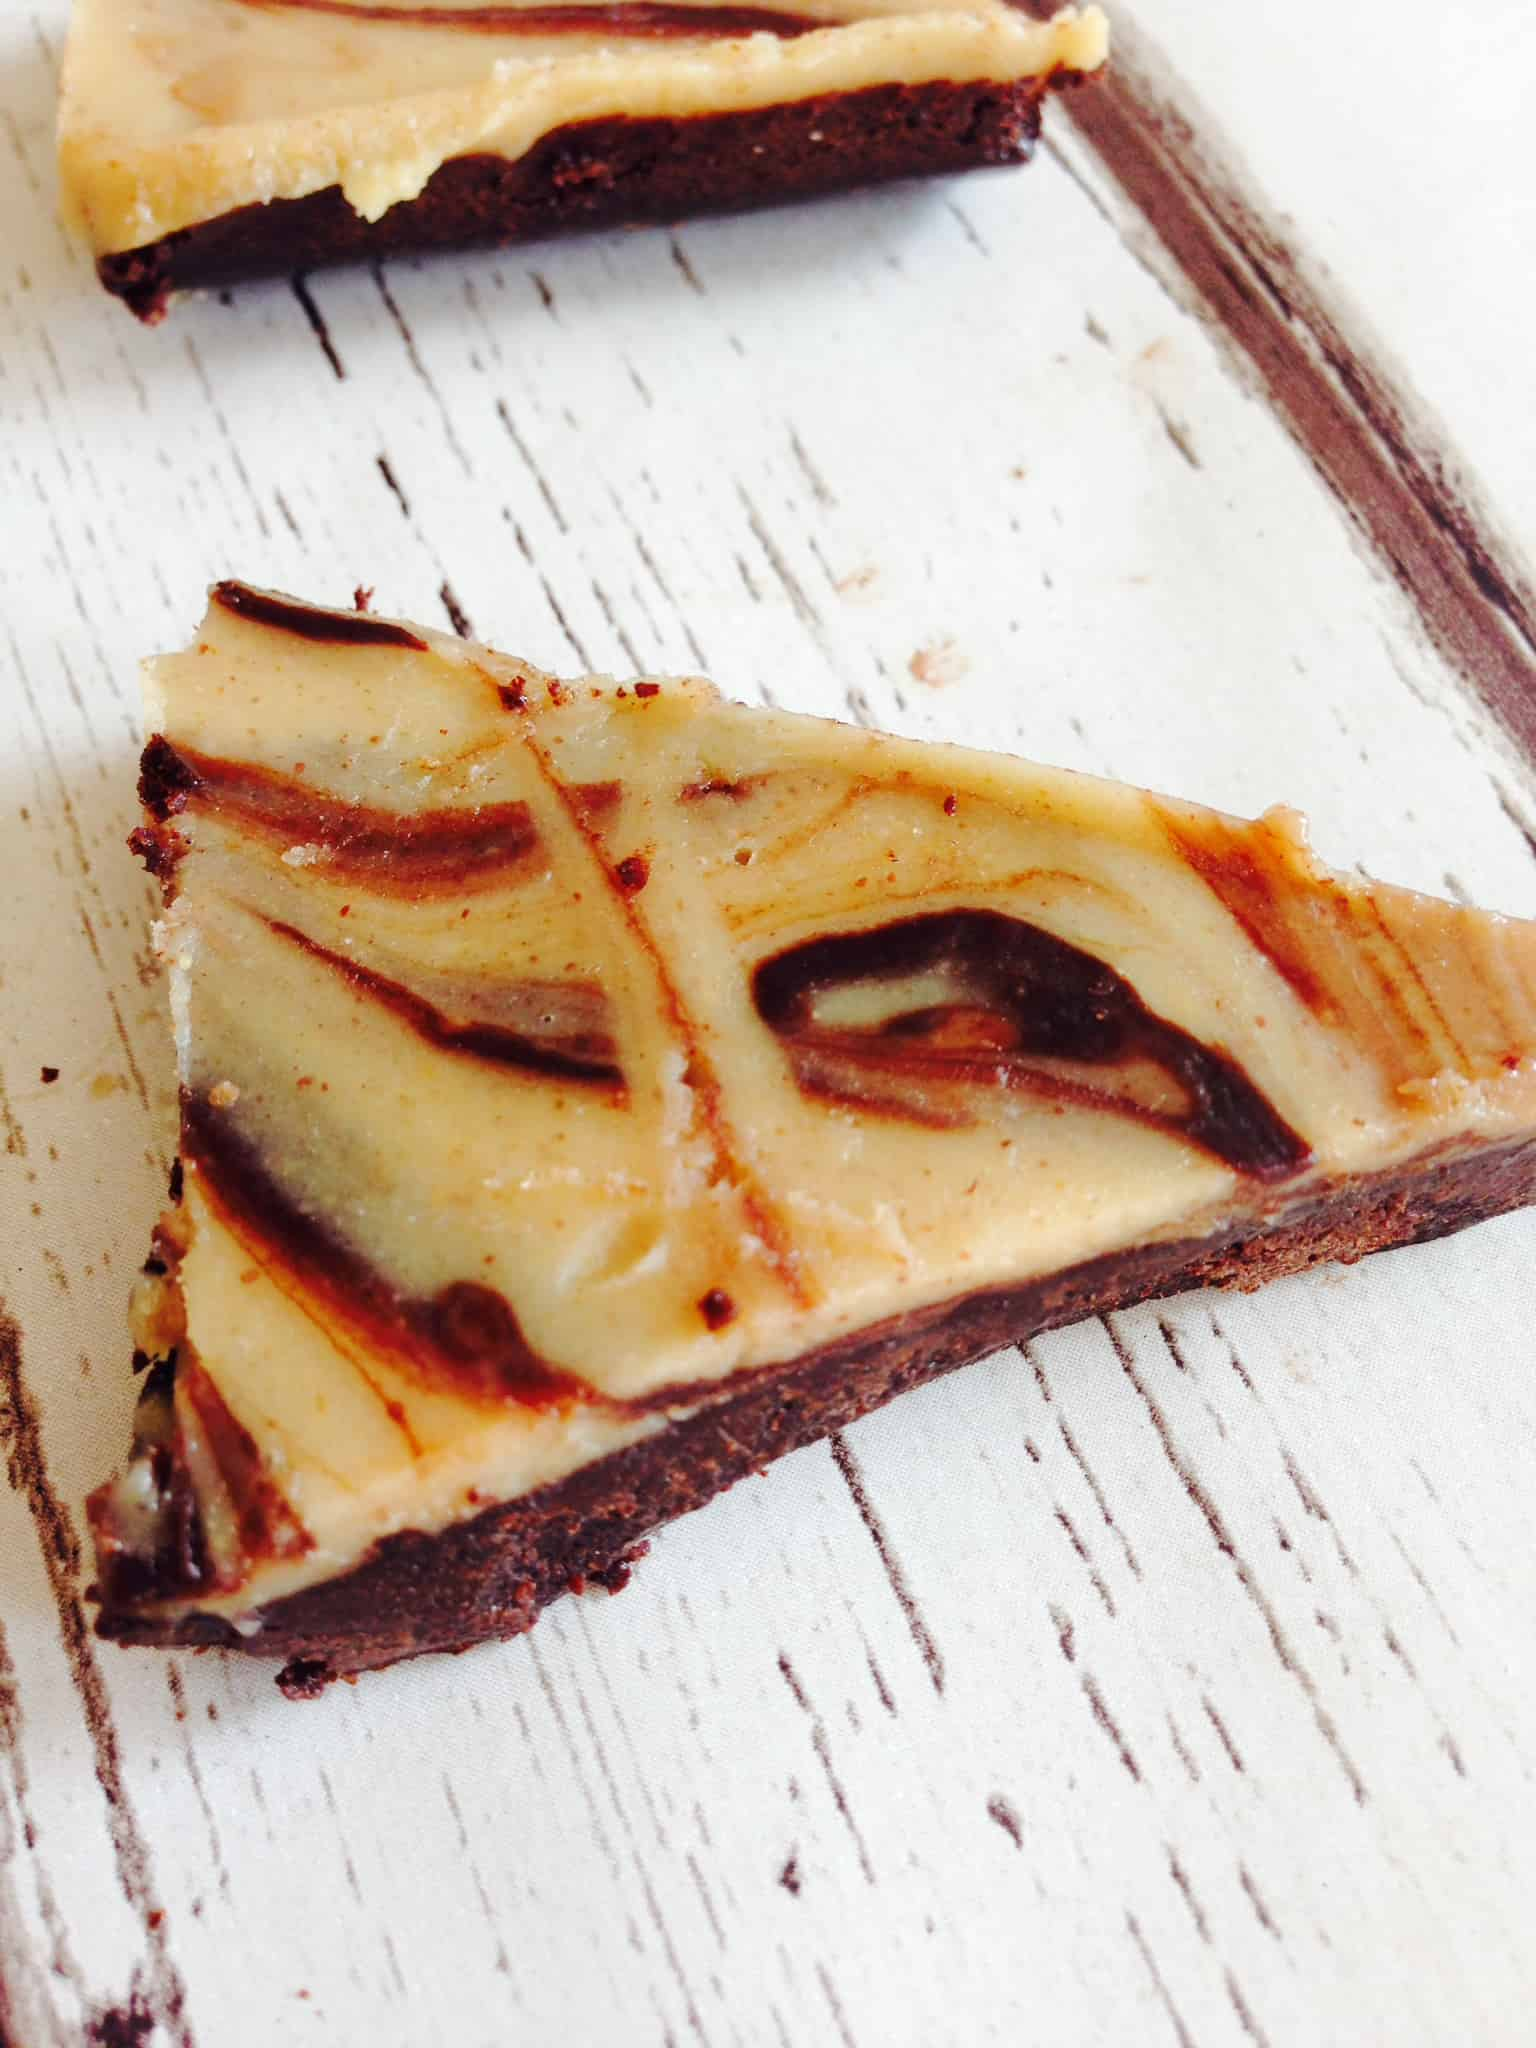 Raw chocolate recipe